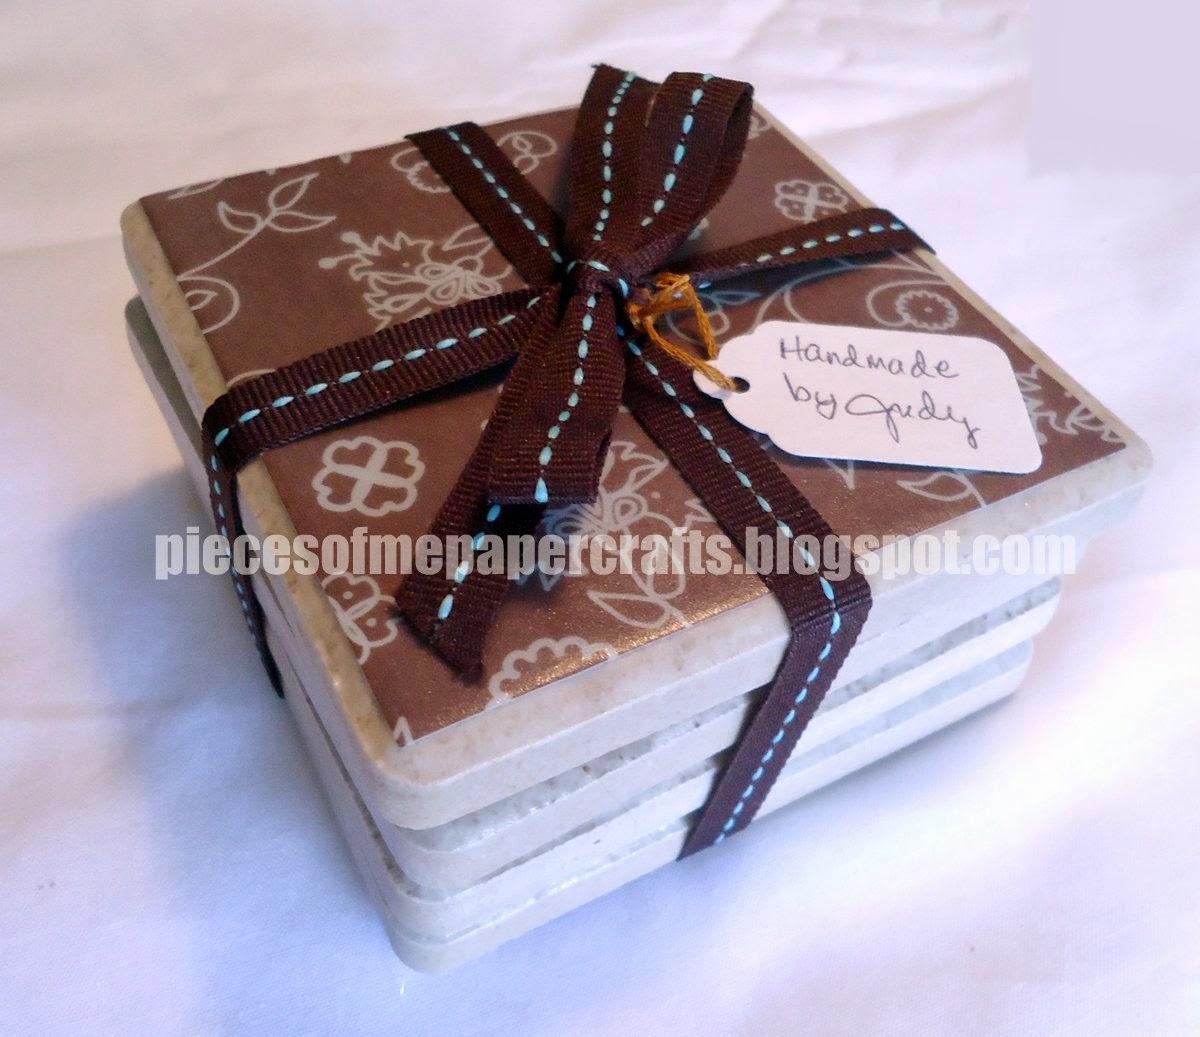 Ceramic tile crafts ideas